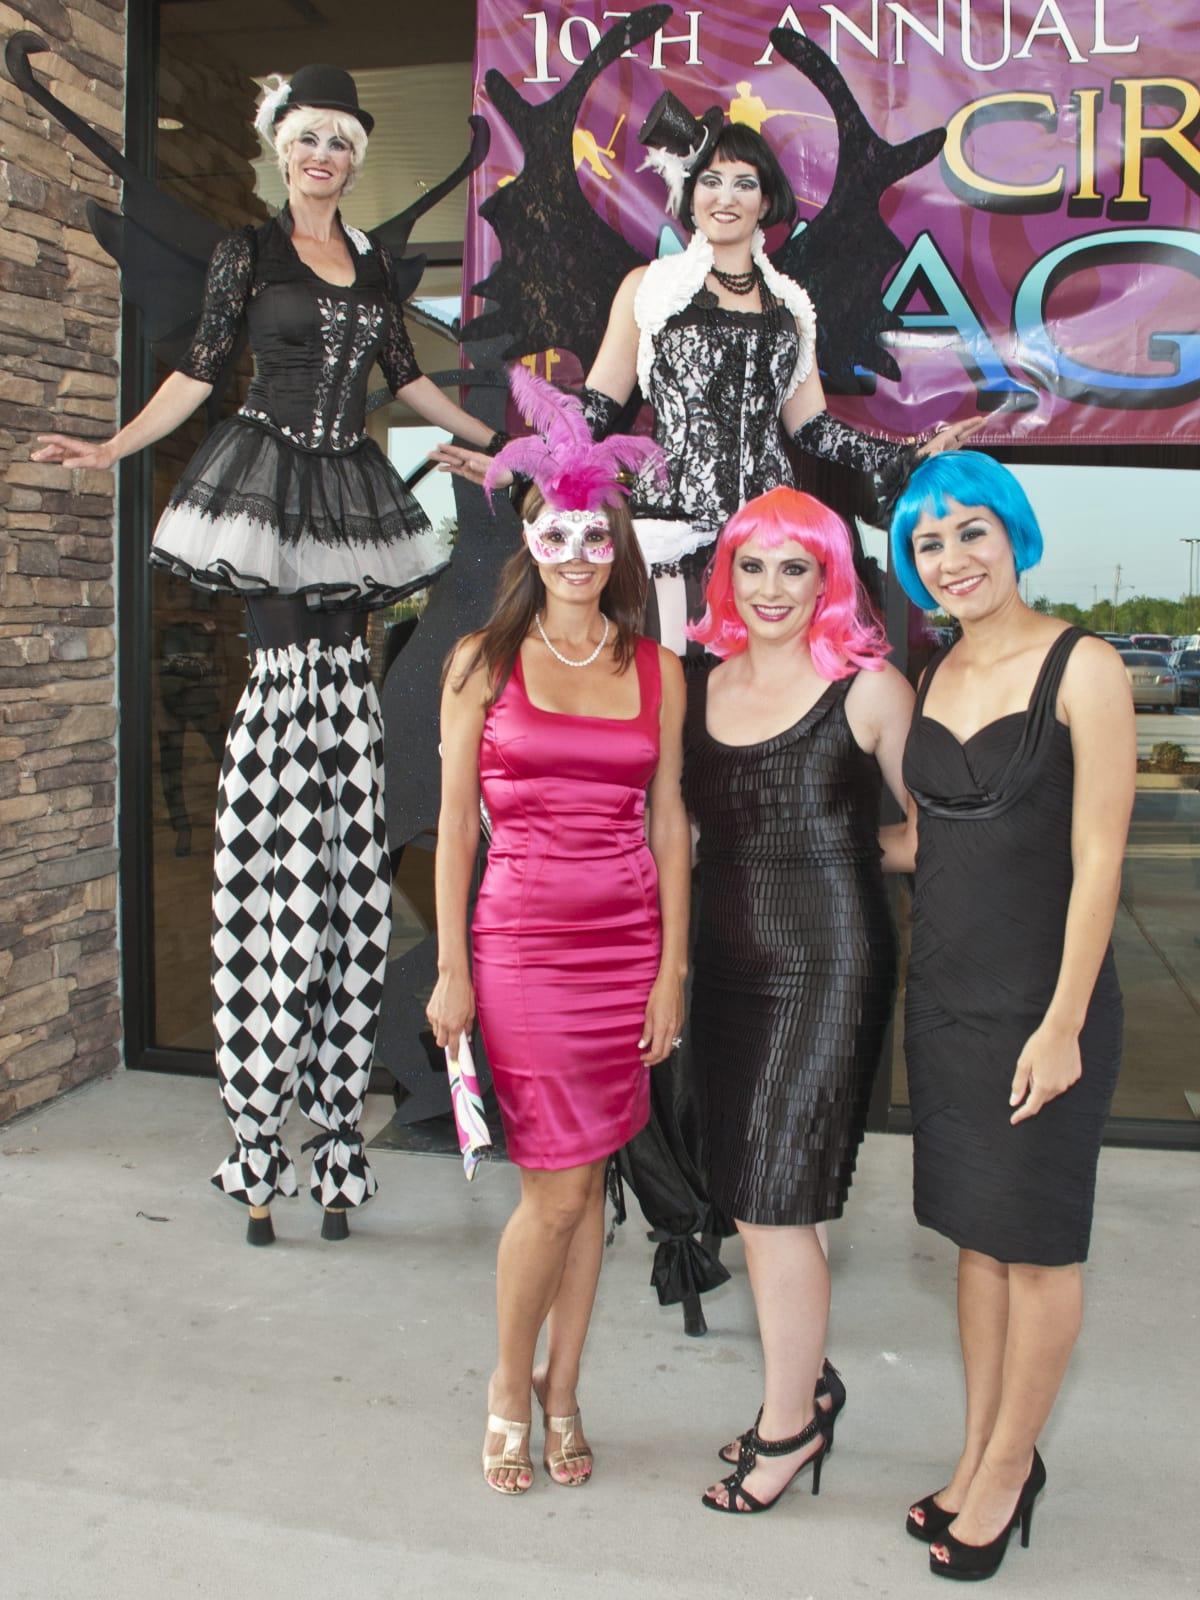 News_001_Cirque Magnifique_Cindy Garza Farmer_Amy Pavlik_Gabi De la Rosa.jpg